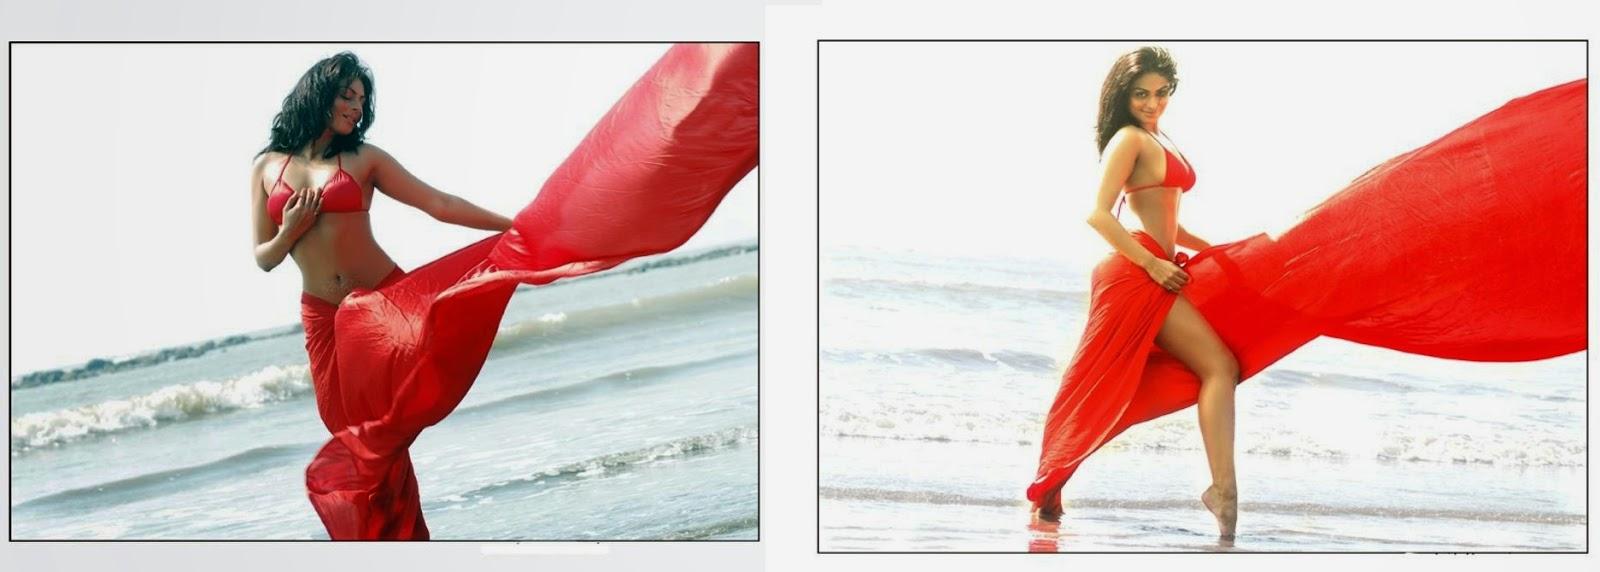 neeru bajwa navel show pcis in saree latest neeru bajwa hot navel show pics free download